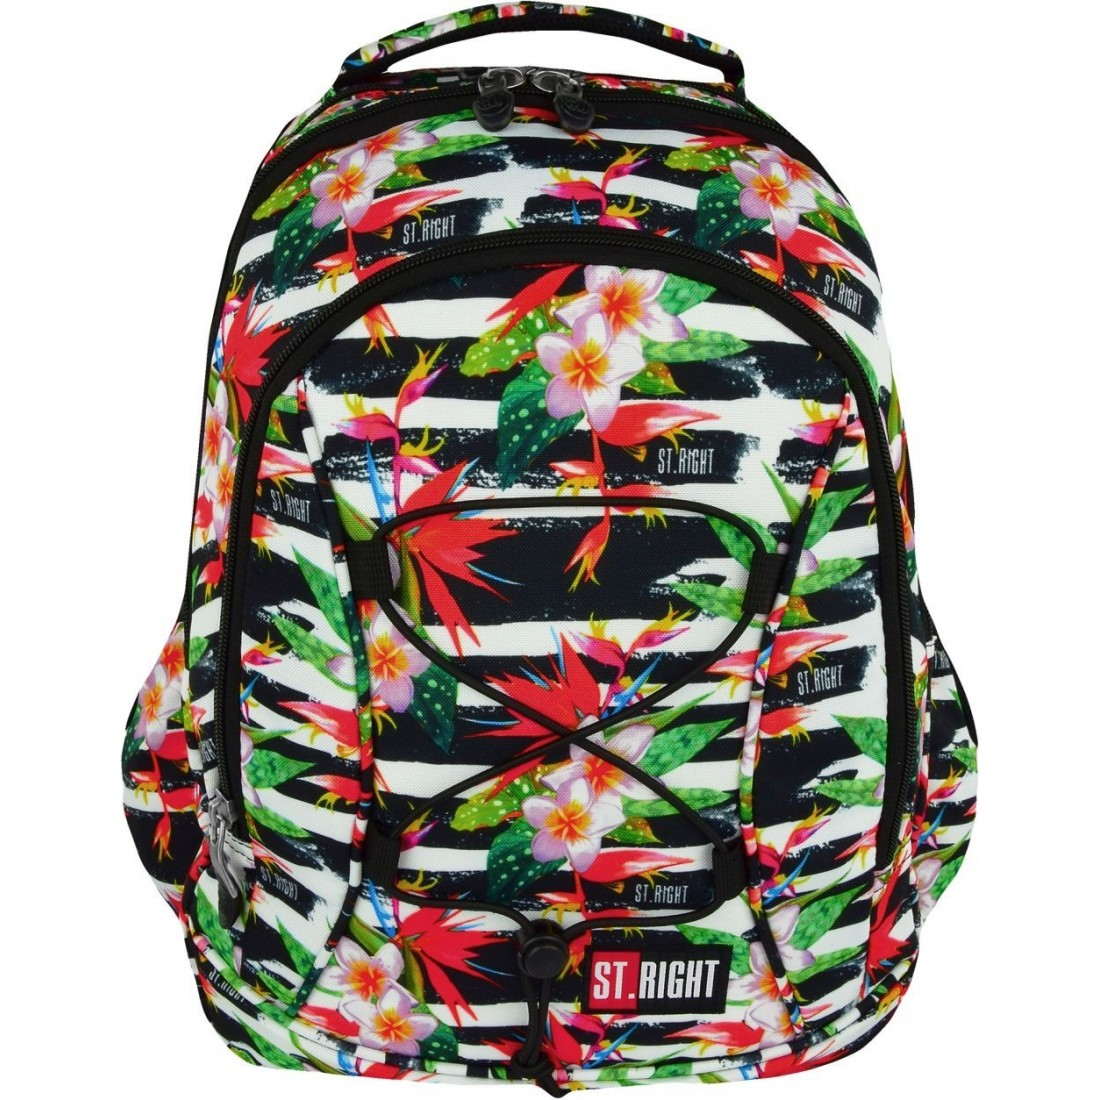 a5fff1f5cec9e Plecak szkolny 32 ST.RIGHT TROPICAL STRIPES kwiat hibiskusa dla dziewczyn